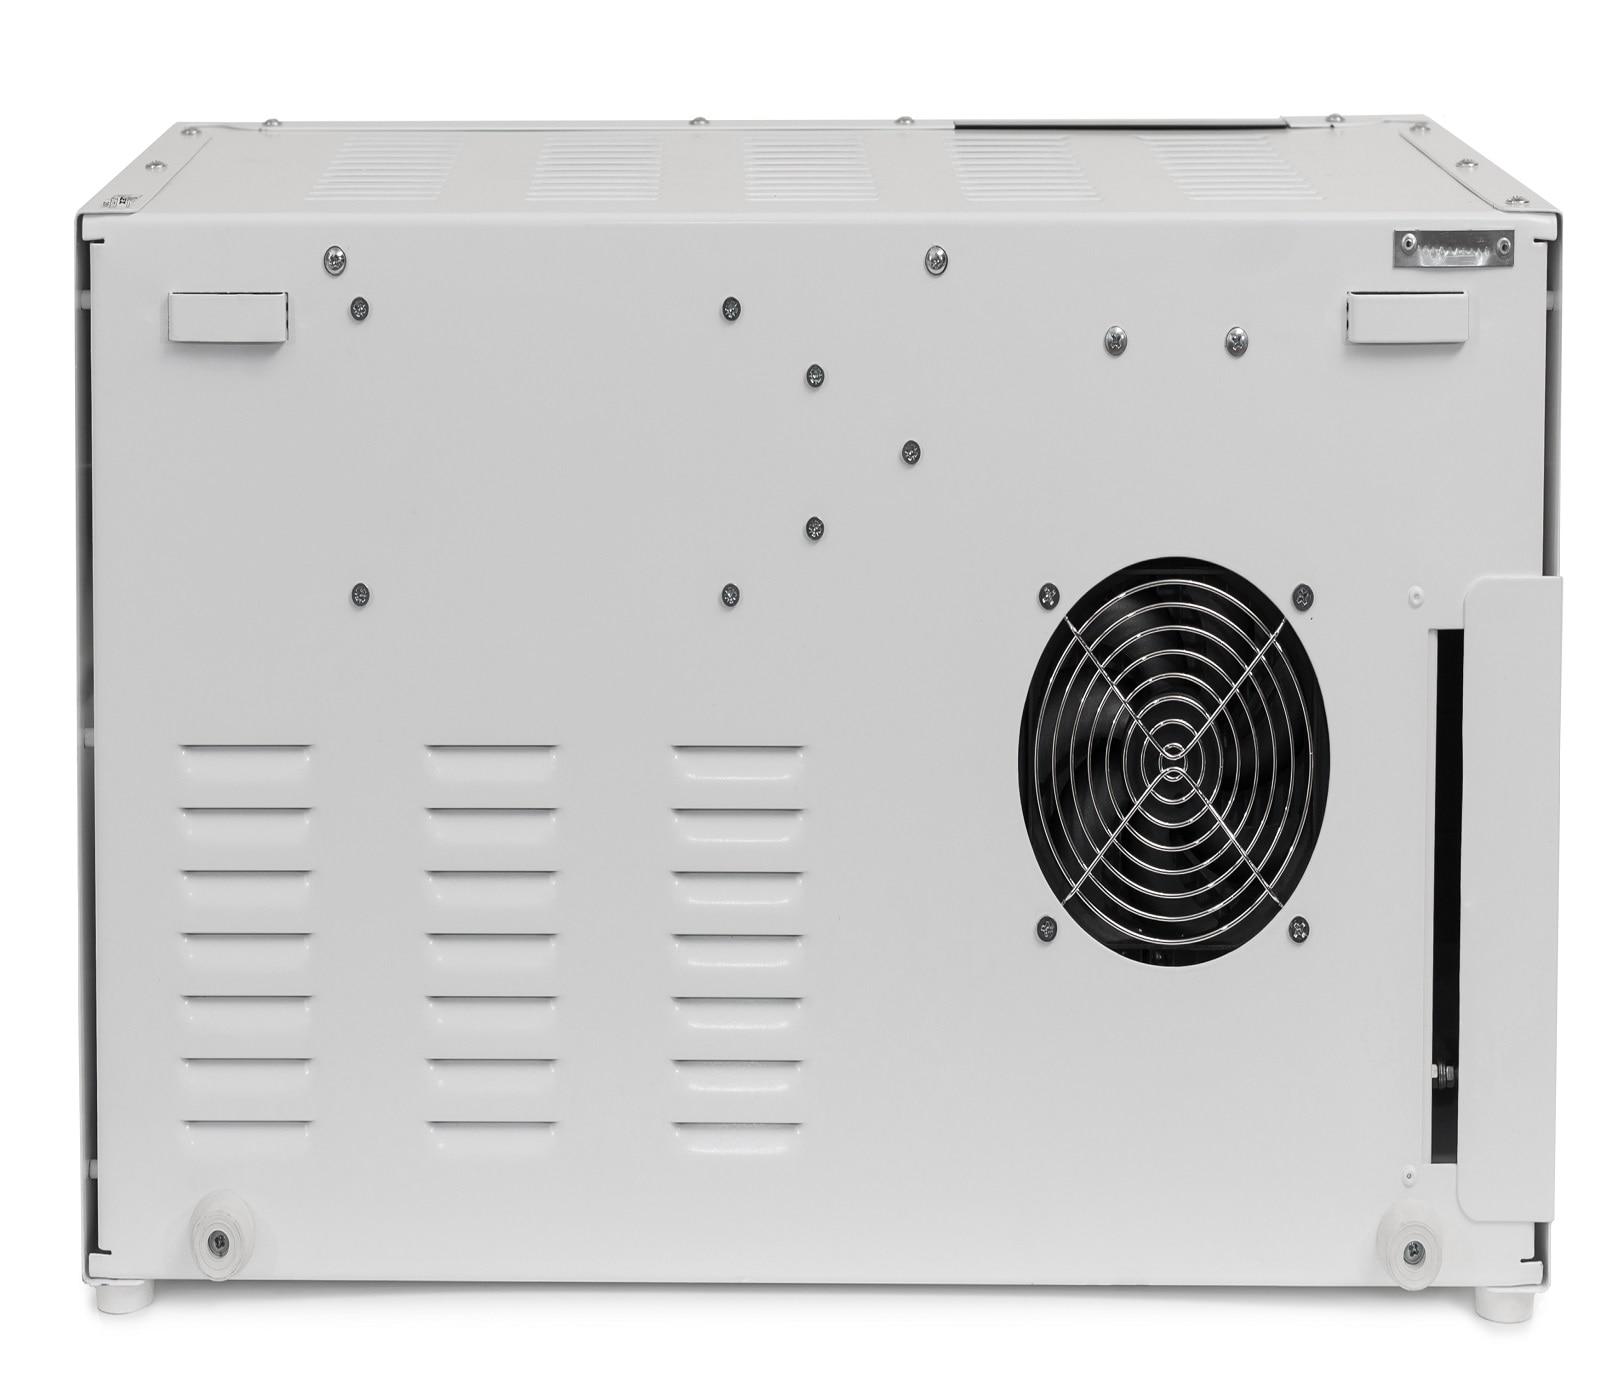 Стабилизаторы напряжения - Стабилизатор напряжения 20 кВт РRIME 000001461 - Фото 3